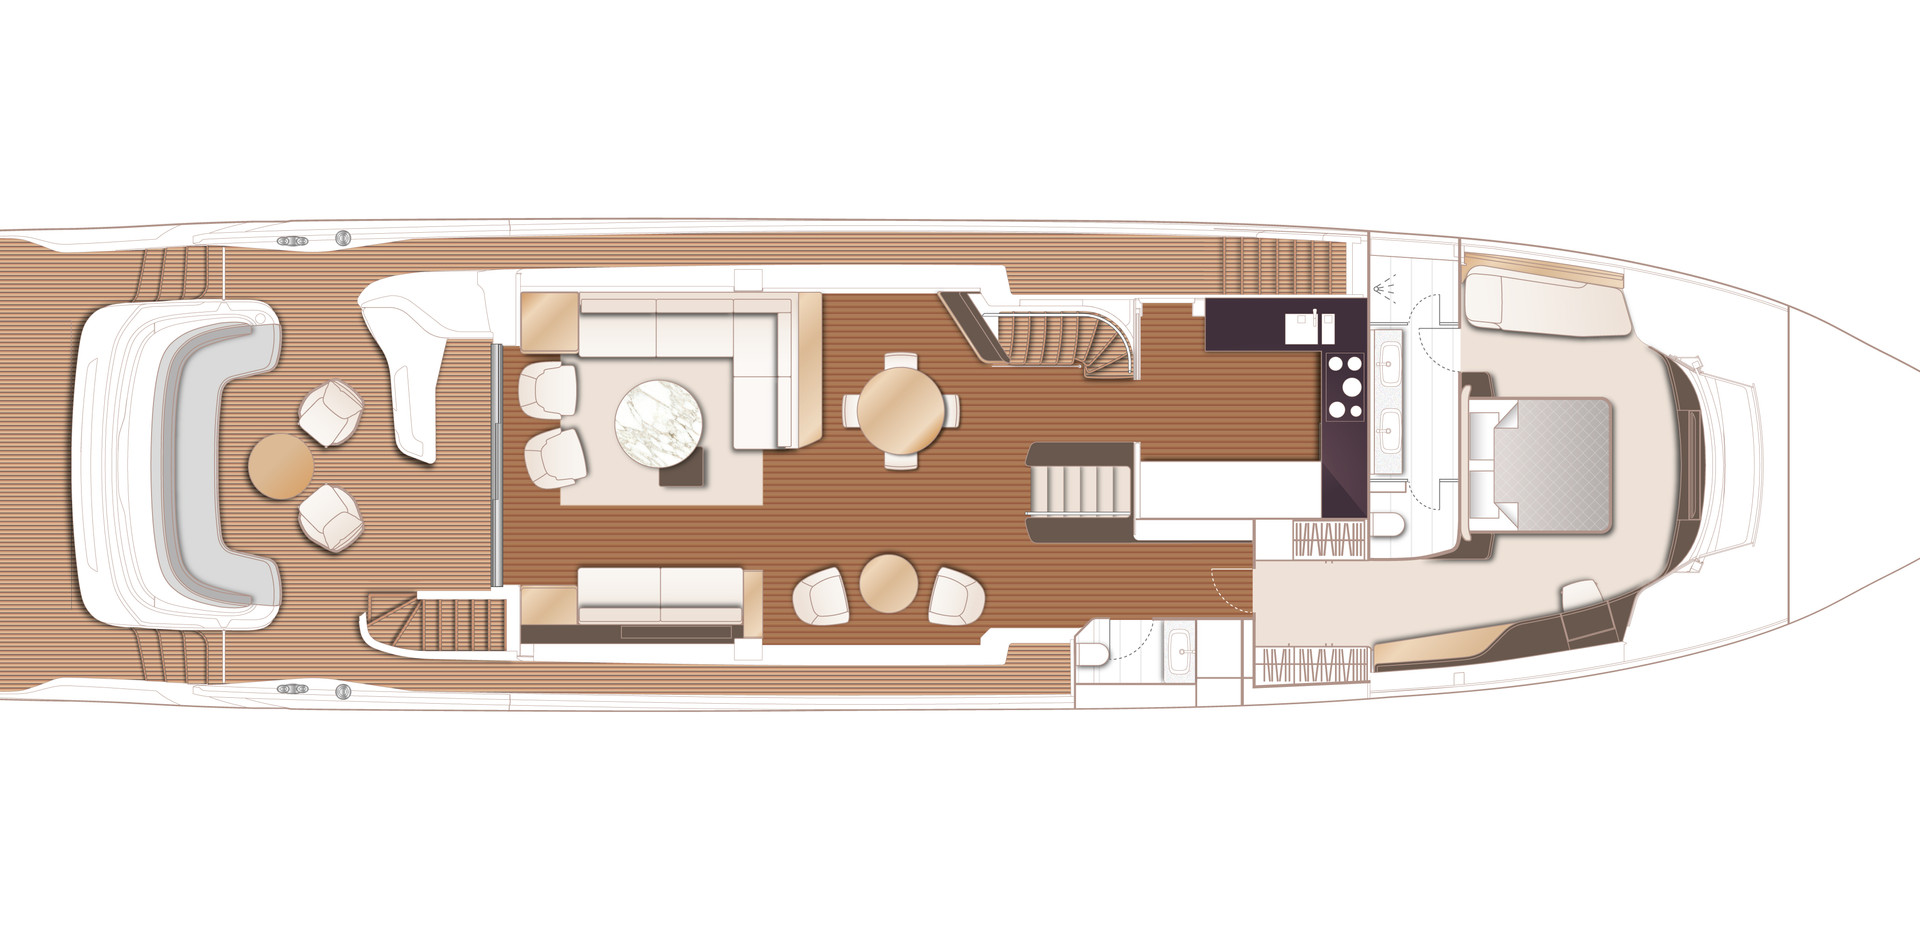 x95-layout-main-deck-optional-forward-ma